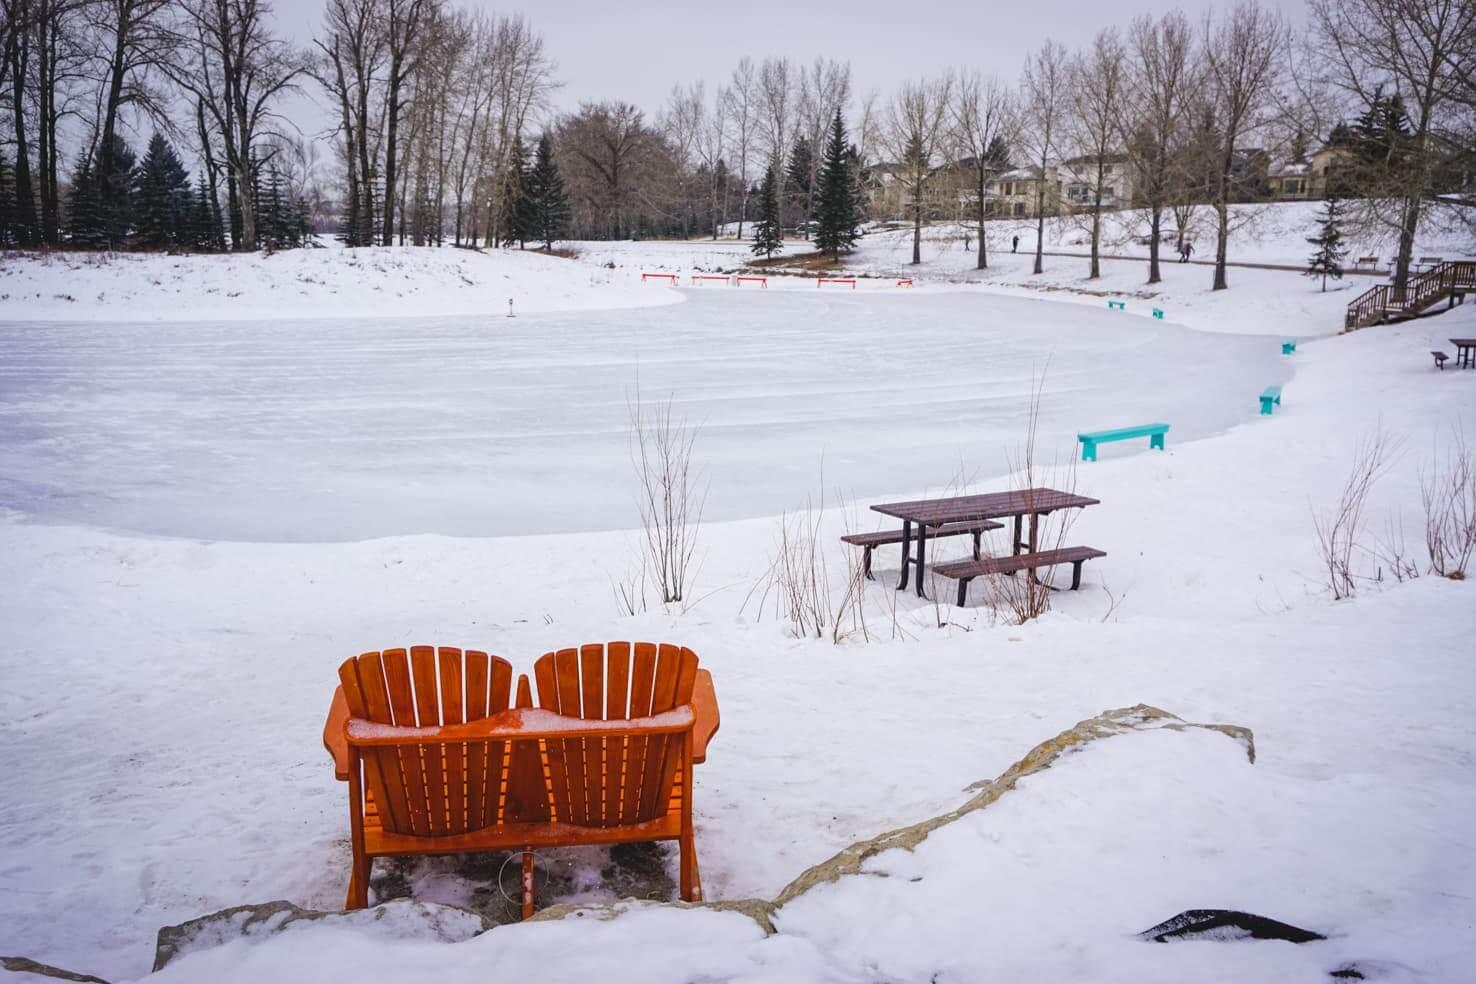 Outdoor Ice Skating in Calgary - Carburn Park